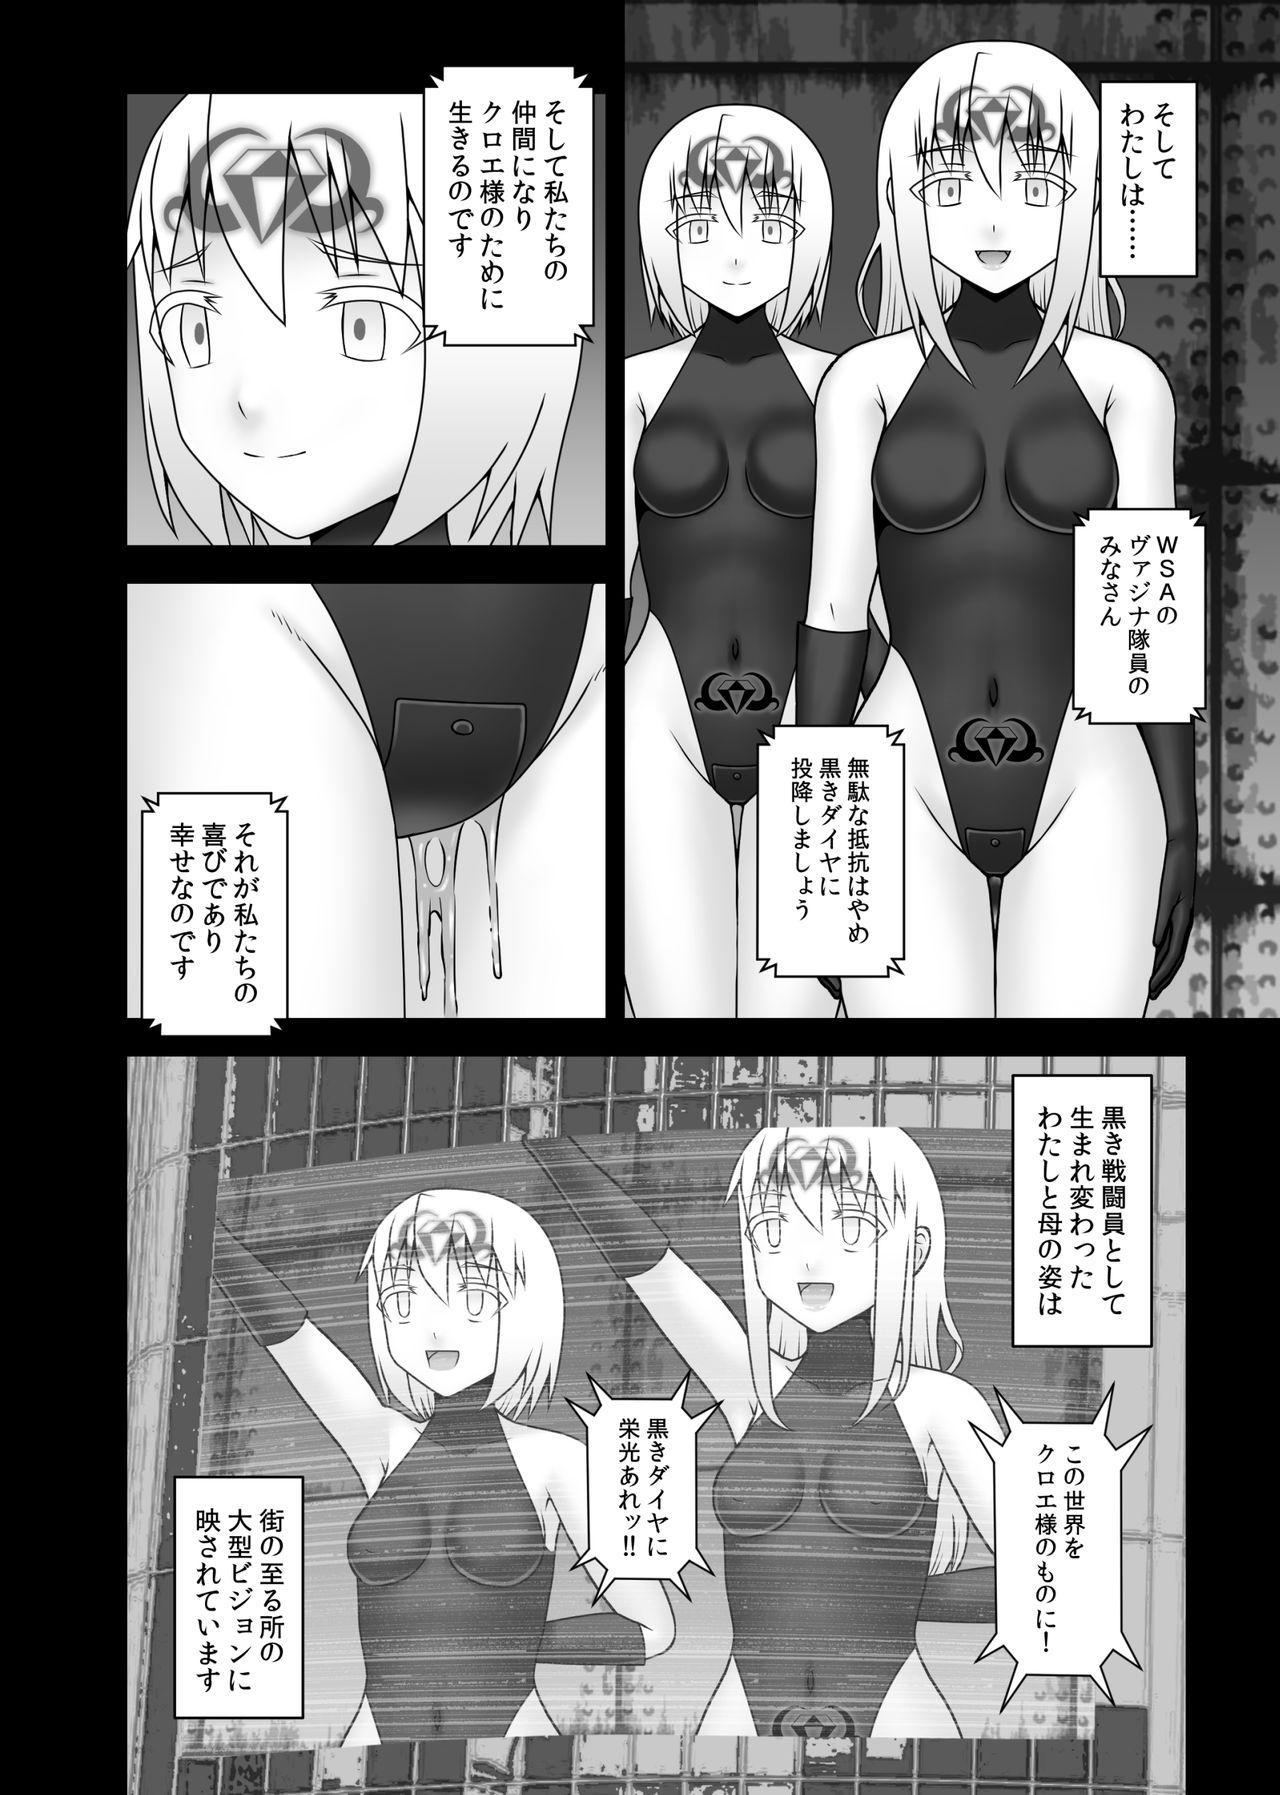 Teisou Sentai Virginal Colors Saishuuwa 100